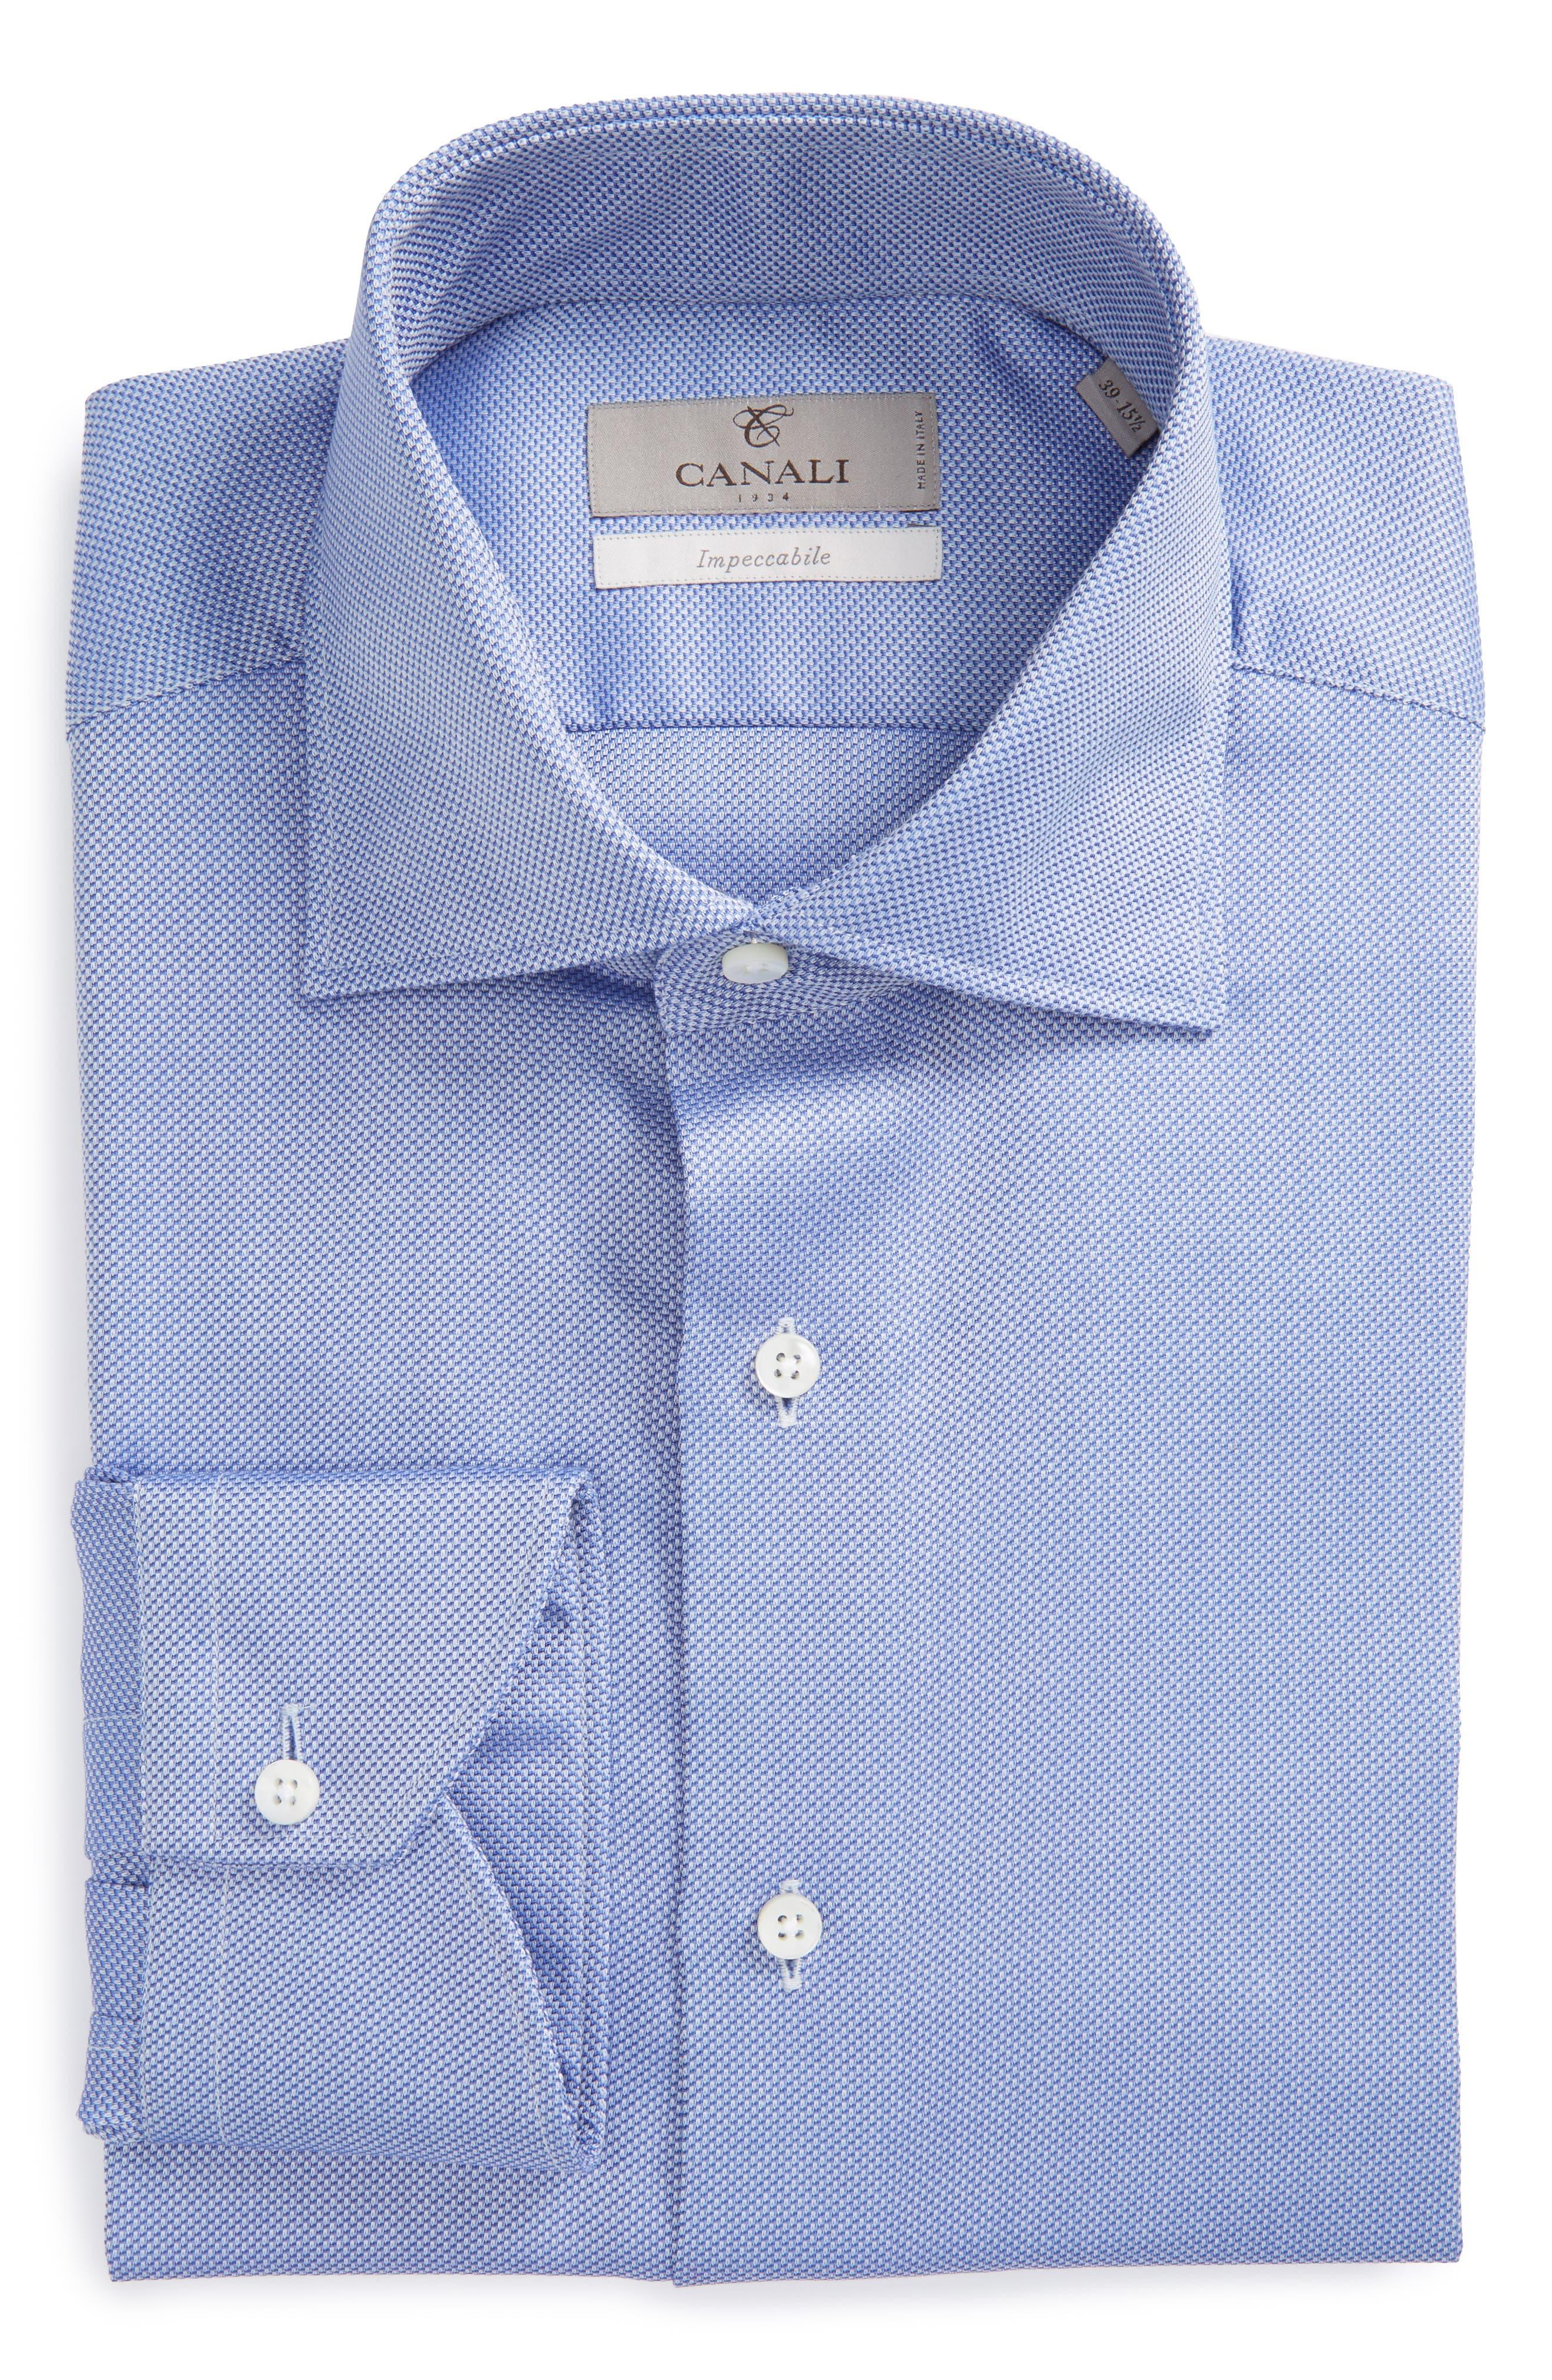 Regular Fit Solid Dress Shirt,                         Main,                         color, 401